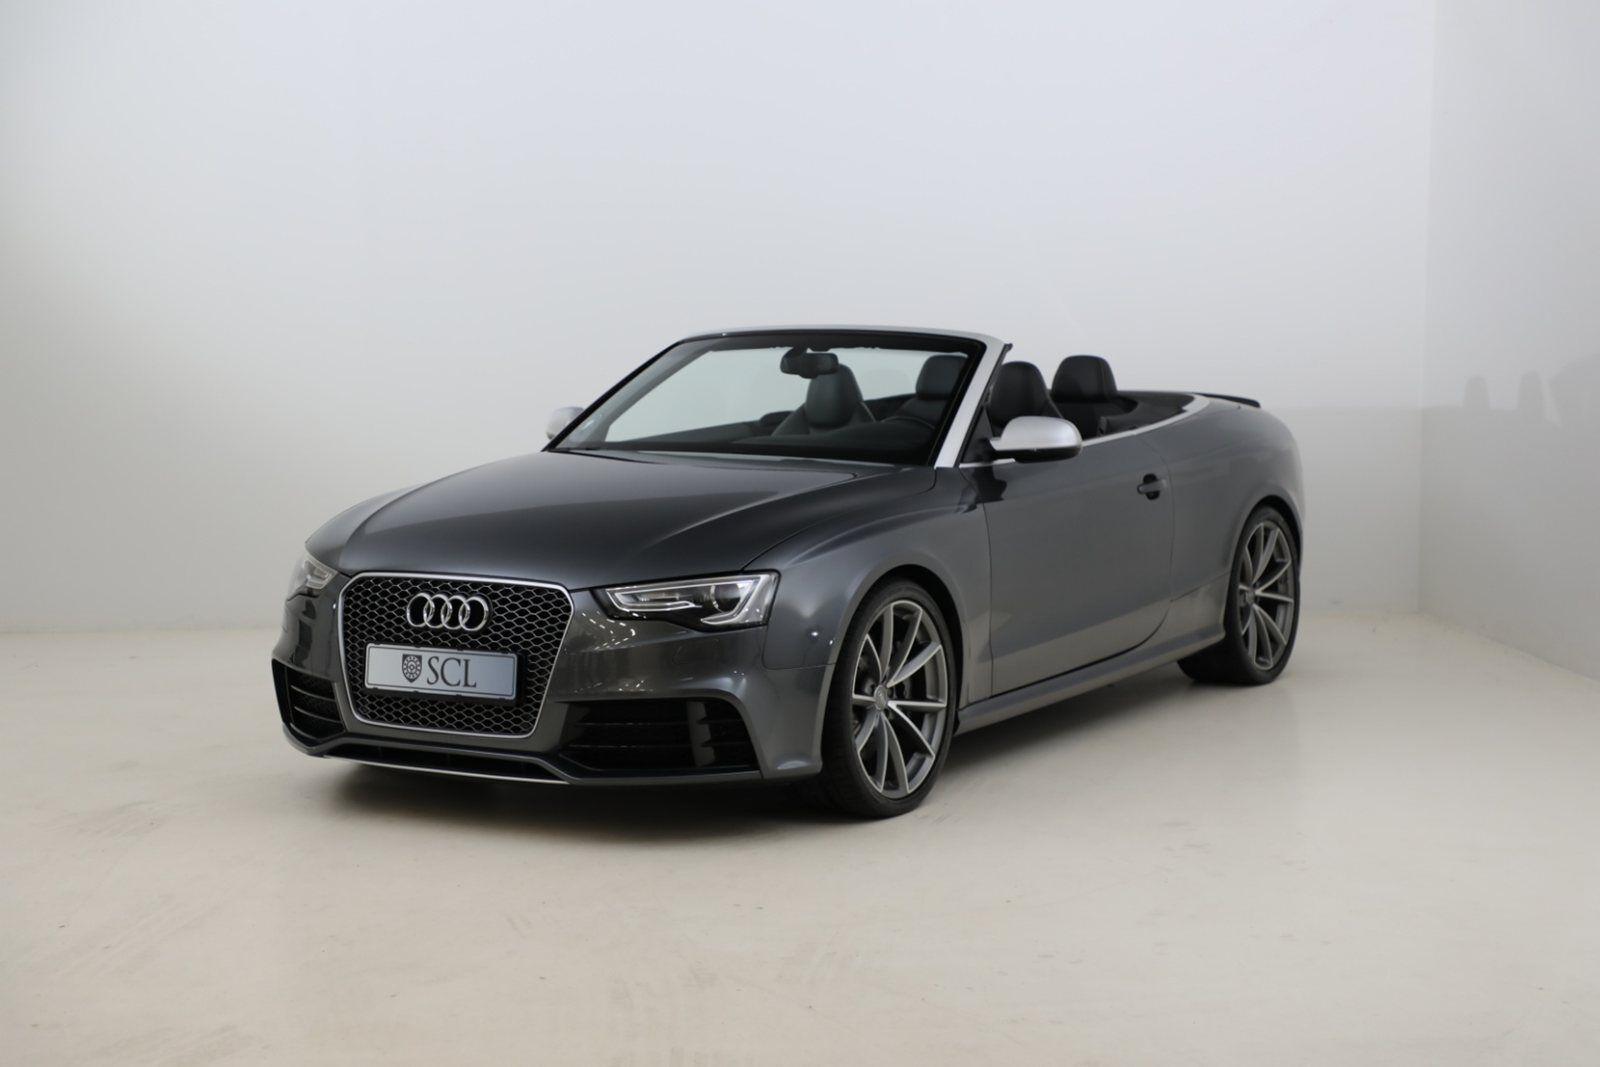 Audi RS5 4,2 FSi Cabriolet quattro S-tr. 2d - 334.900 kr.